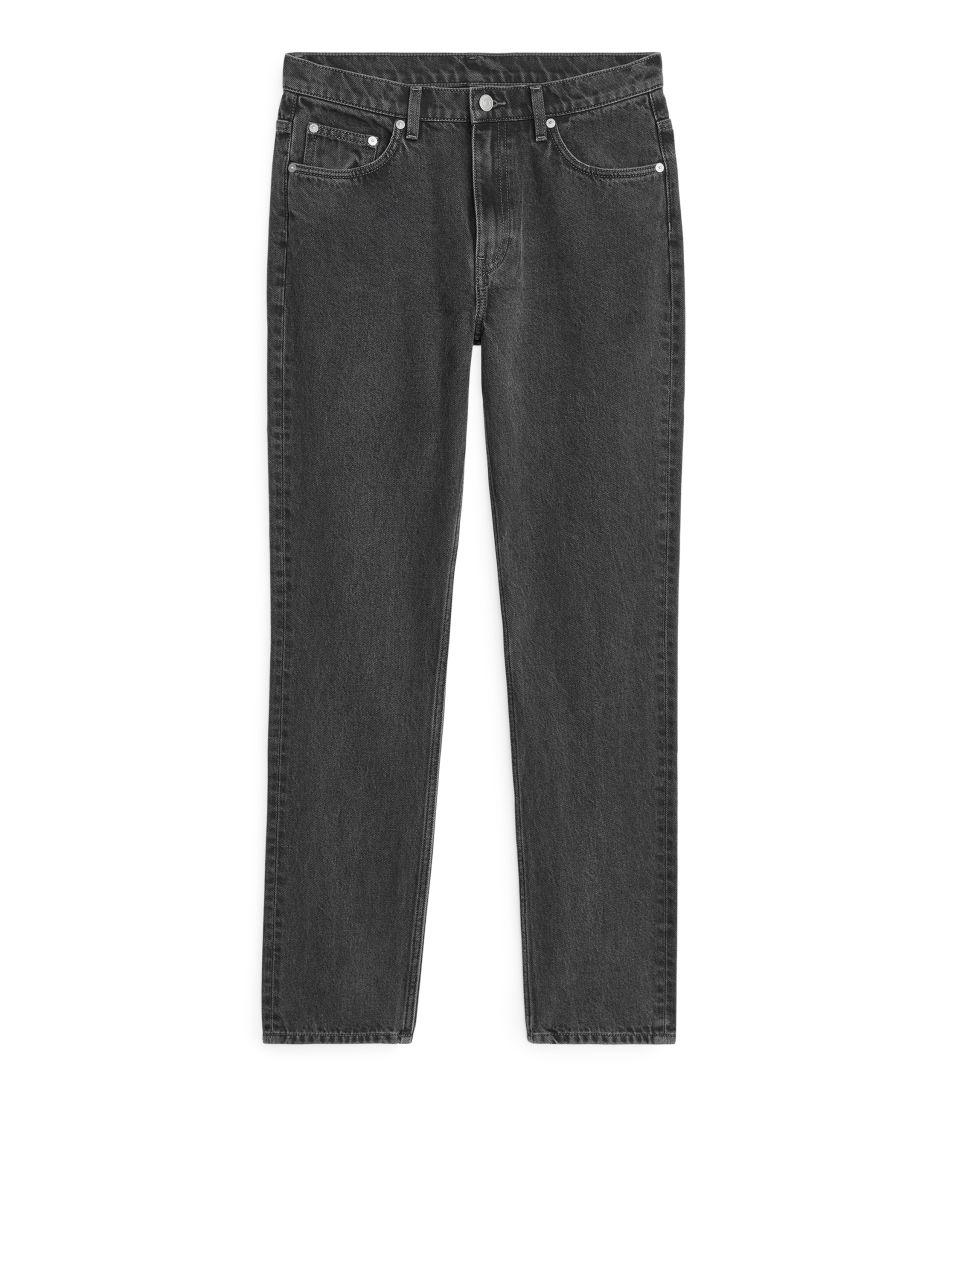 REGULAR Jeans - Black